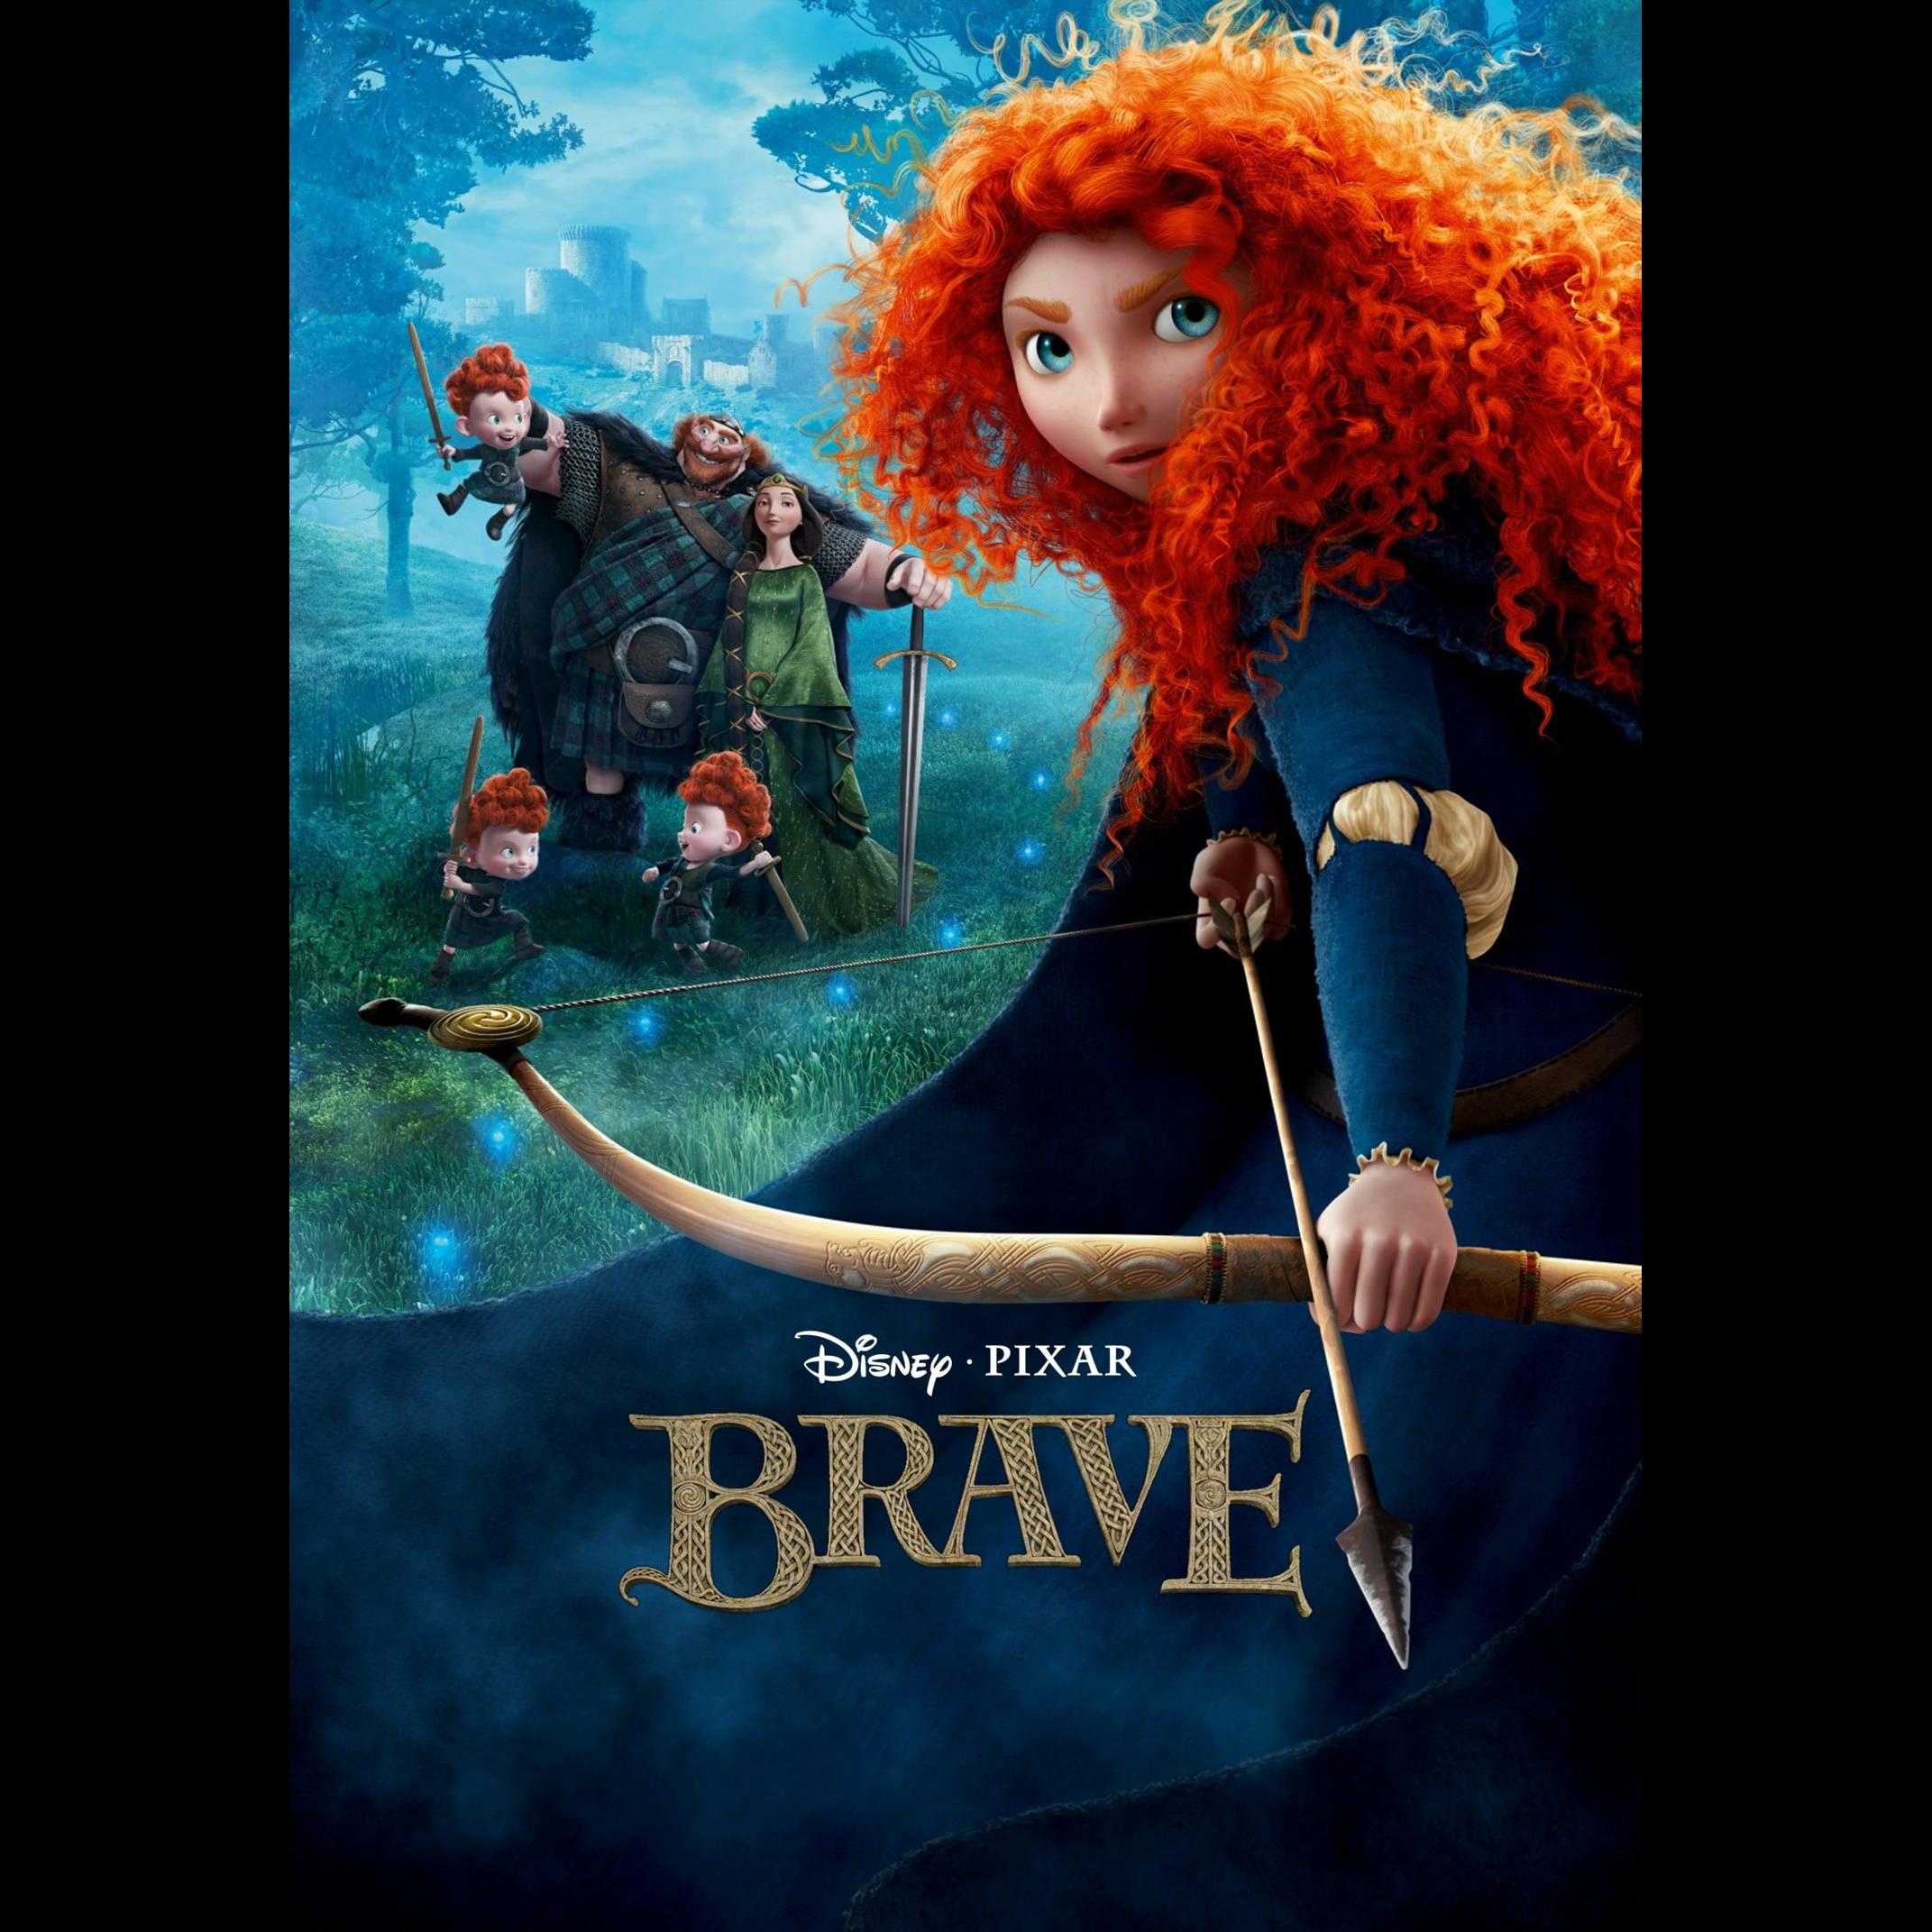 Brave HD